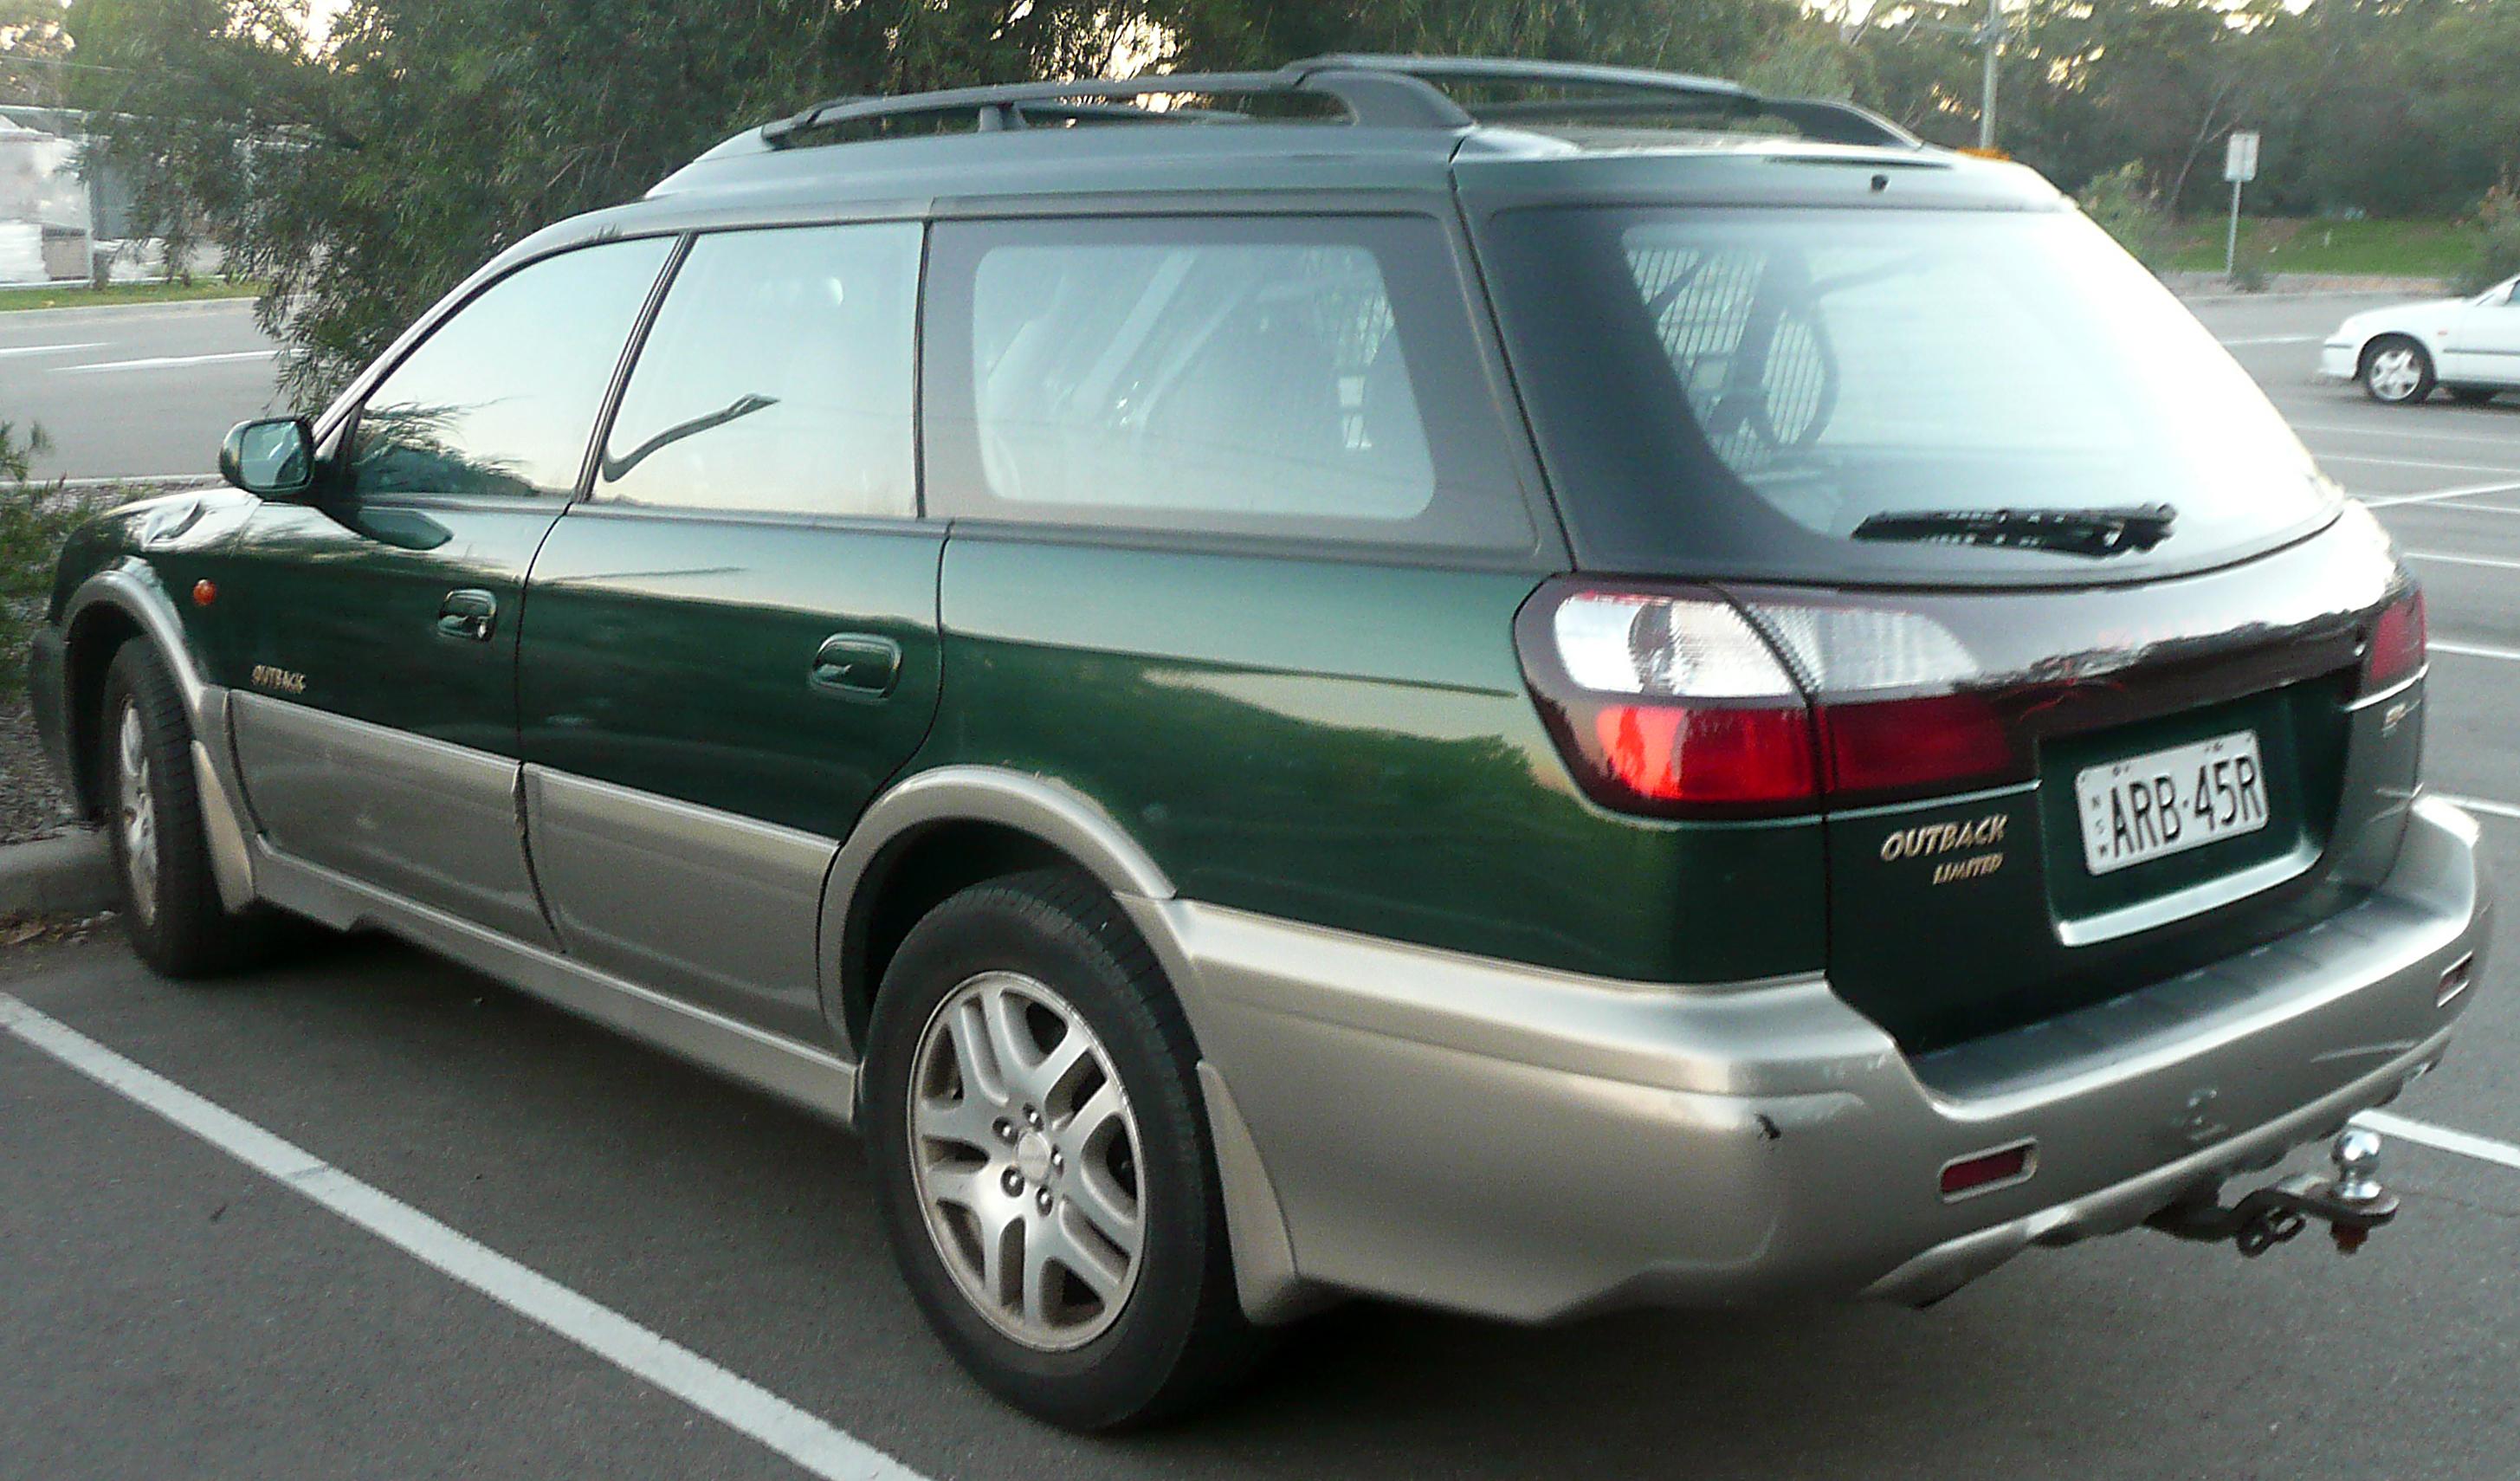 file:1999 subaru outback (bh9) limited station wagon (2009-07-04